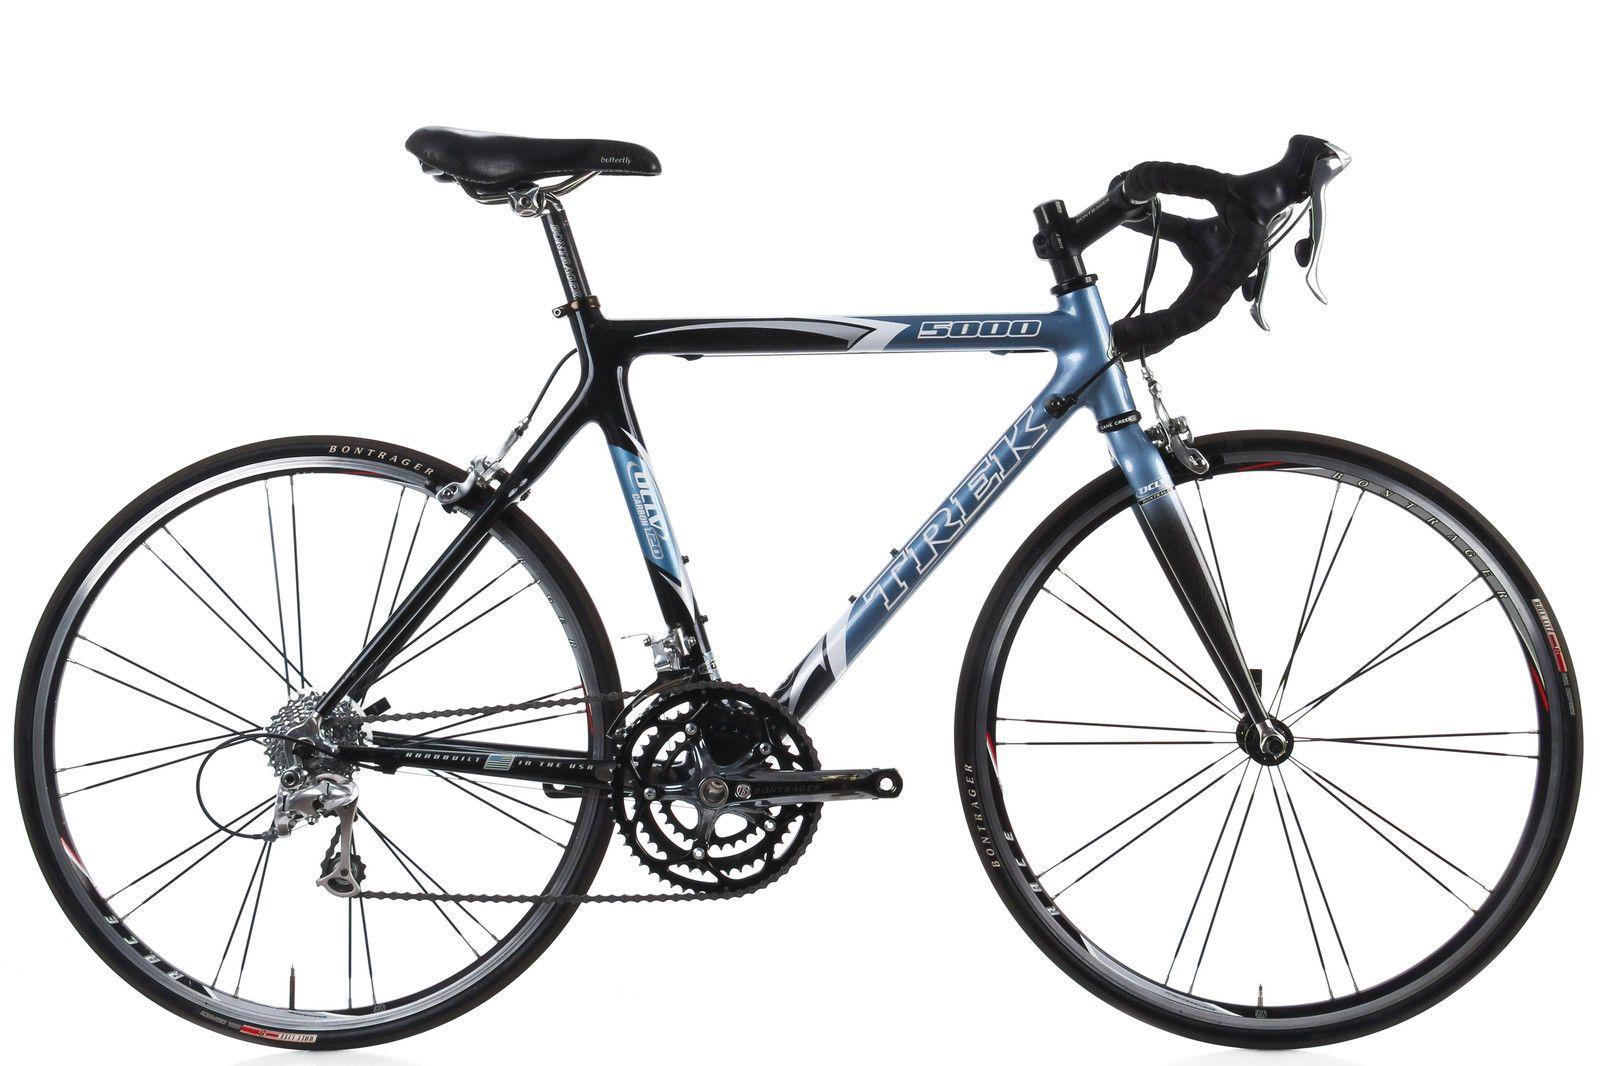 2005 Trek 5000 Wsd Women S Road Bike 51cm Small 650c Carbon Shimano Ultegra Road Bike Women Road Bike Bike